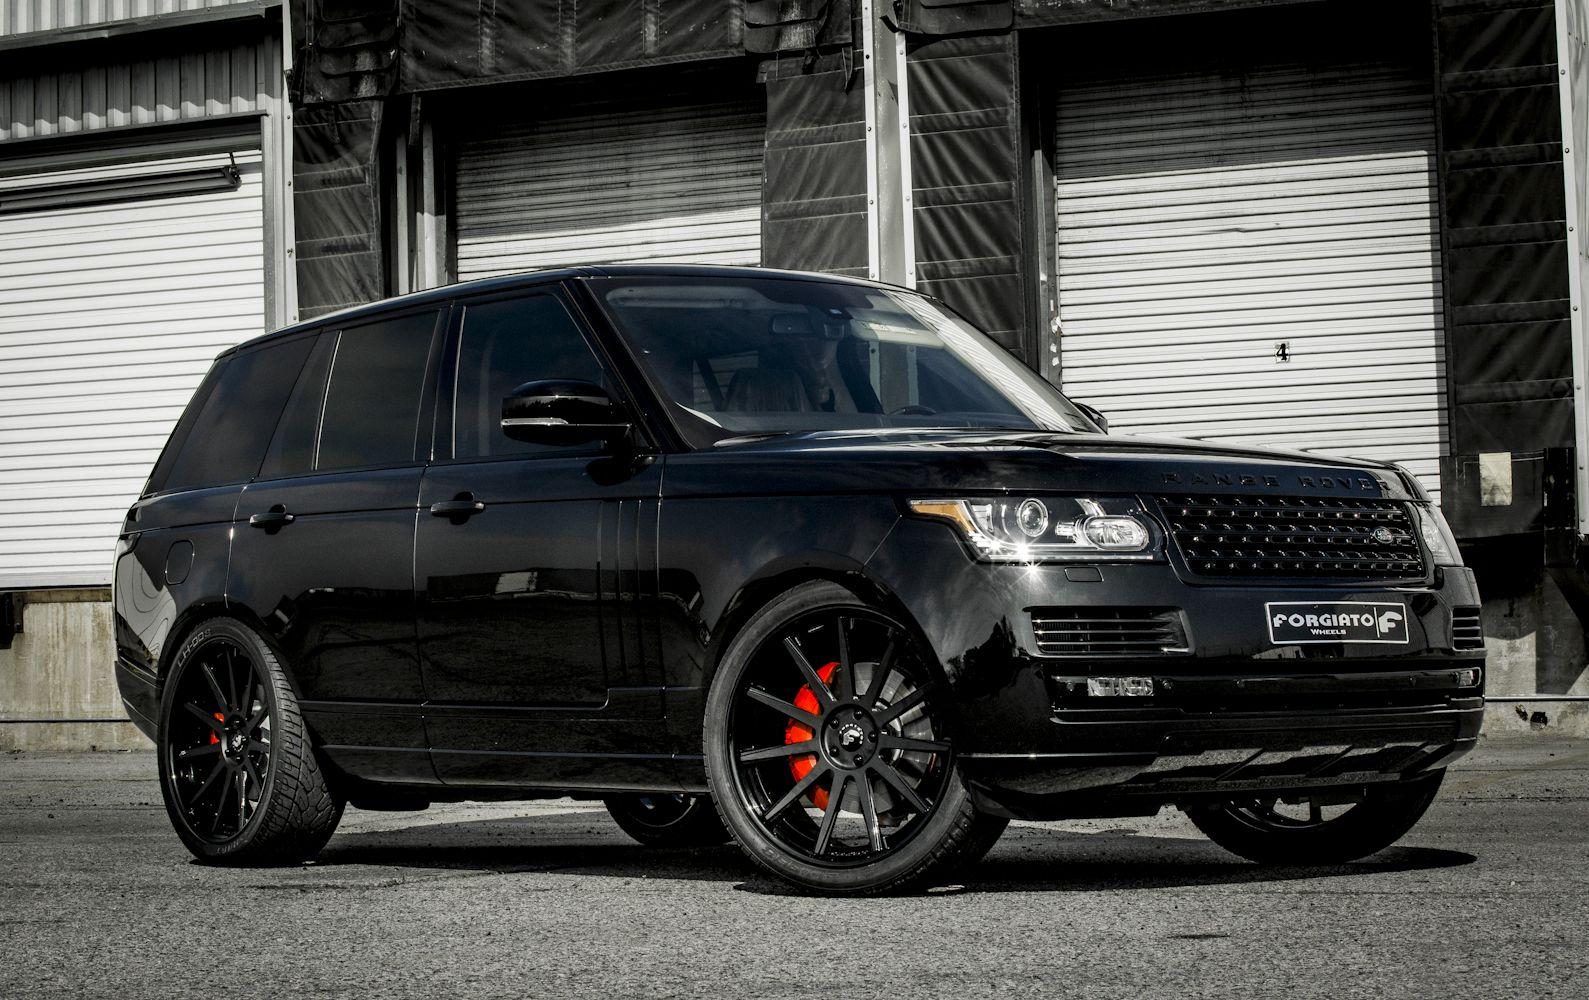 black on black range orlando 1000 of 3 ridez pinterest range rovers ranges and cars. Black Bedroom Furniture Sets. Home Design Ideas